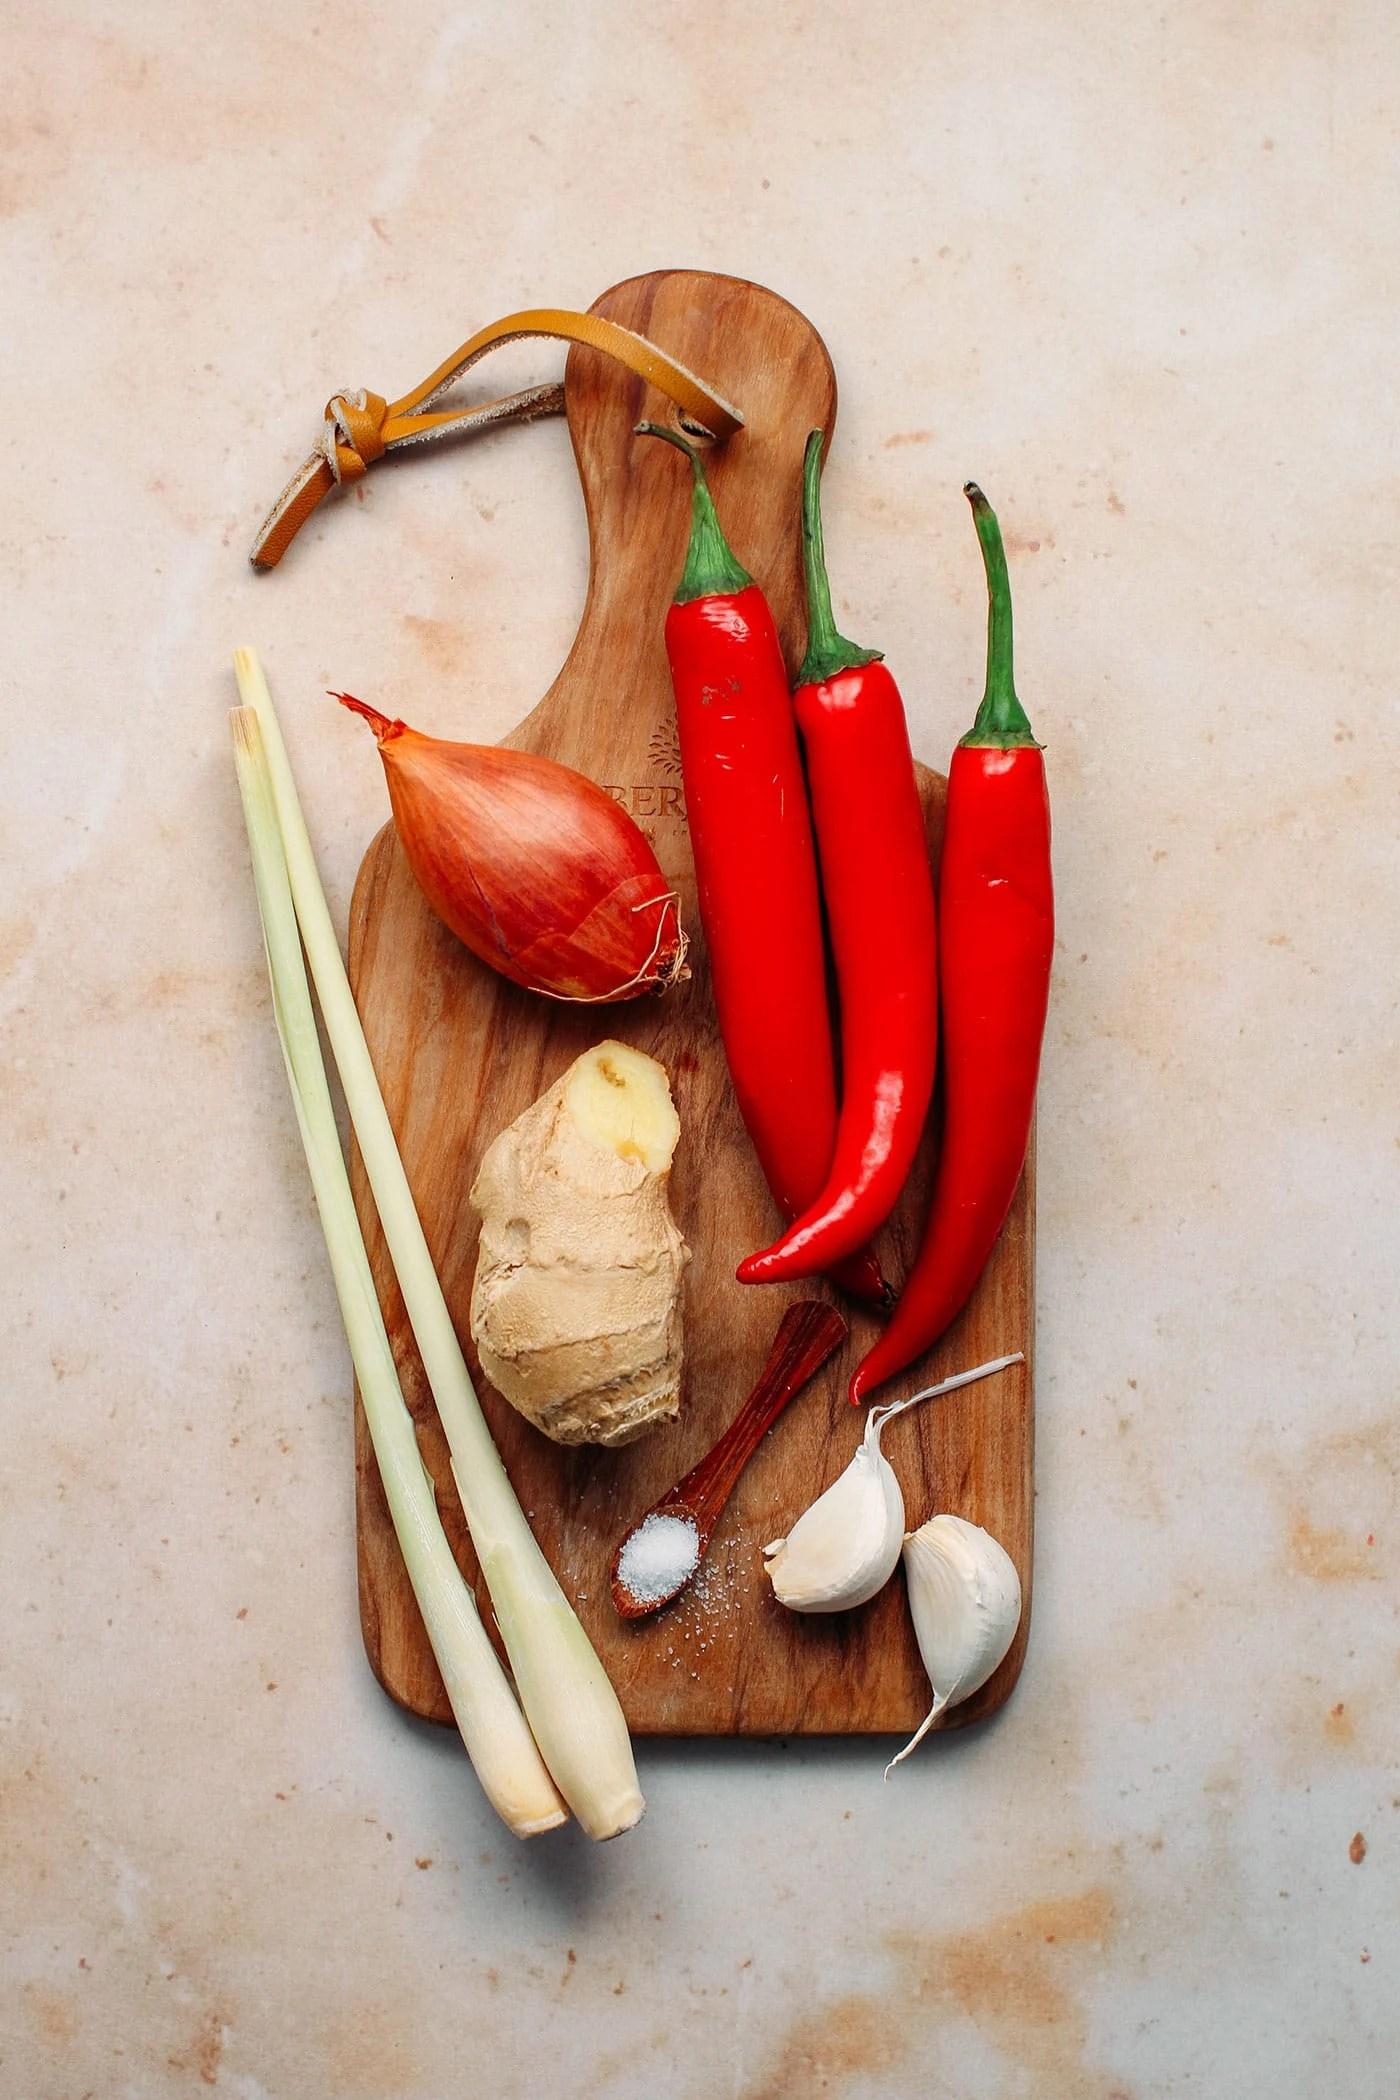 My Favorite Chili Paste